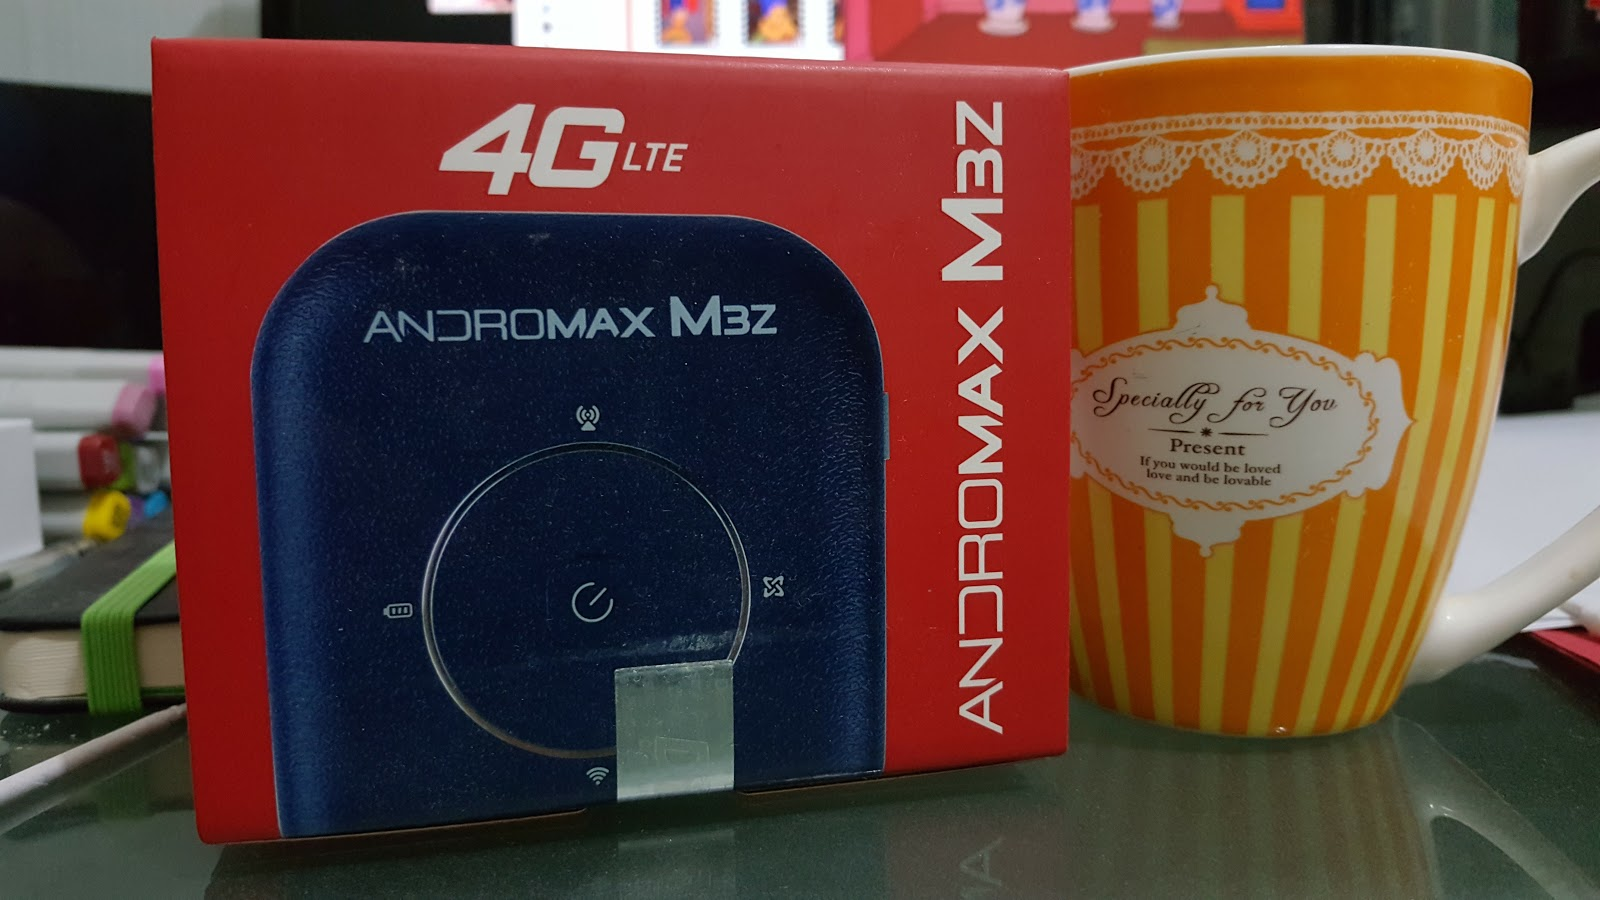 Smartfren M3z Review Bigger And Better Modem Mifi Andromax 4g Lte Coklat Box